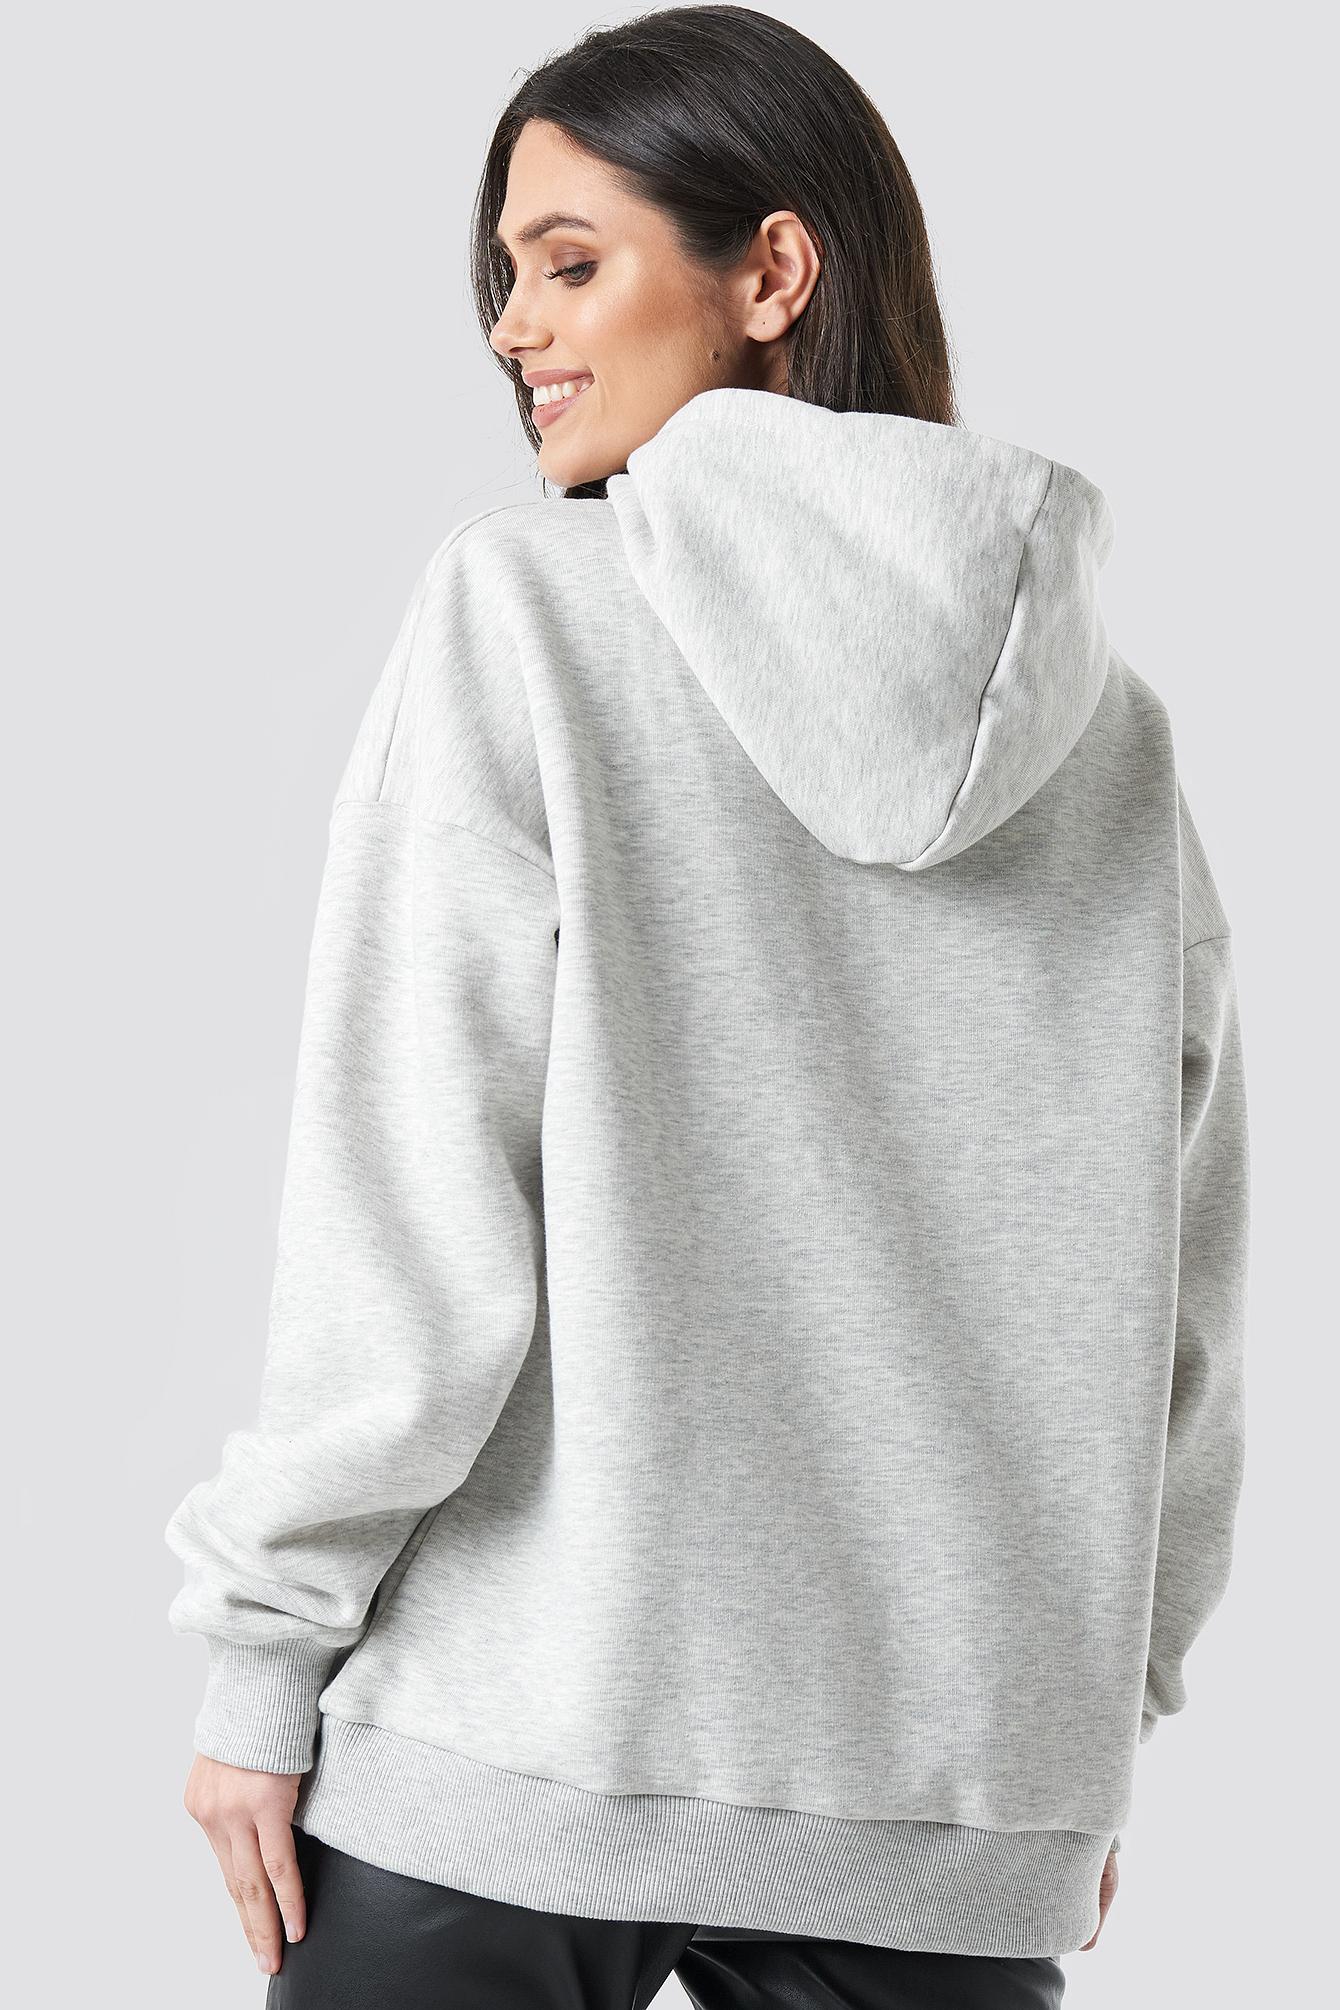 My Choice Oversized Hoodie NA-KD.COM